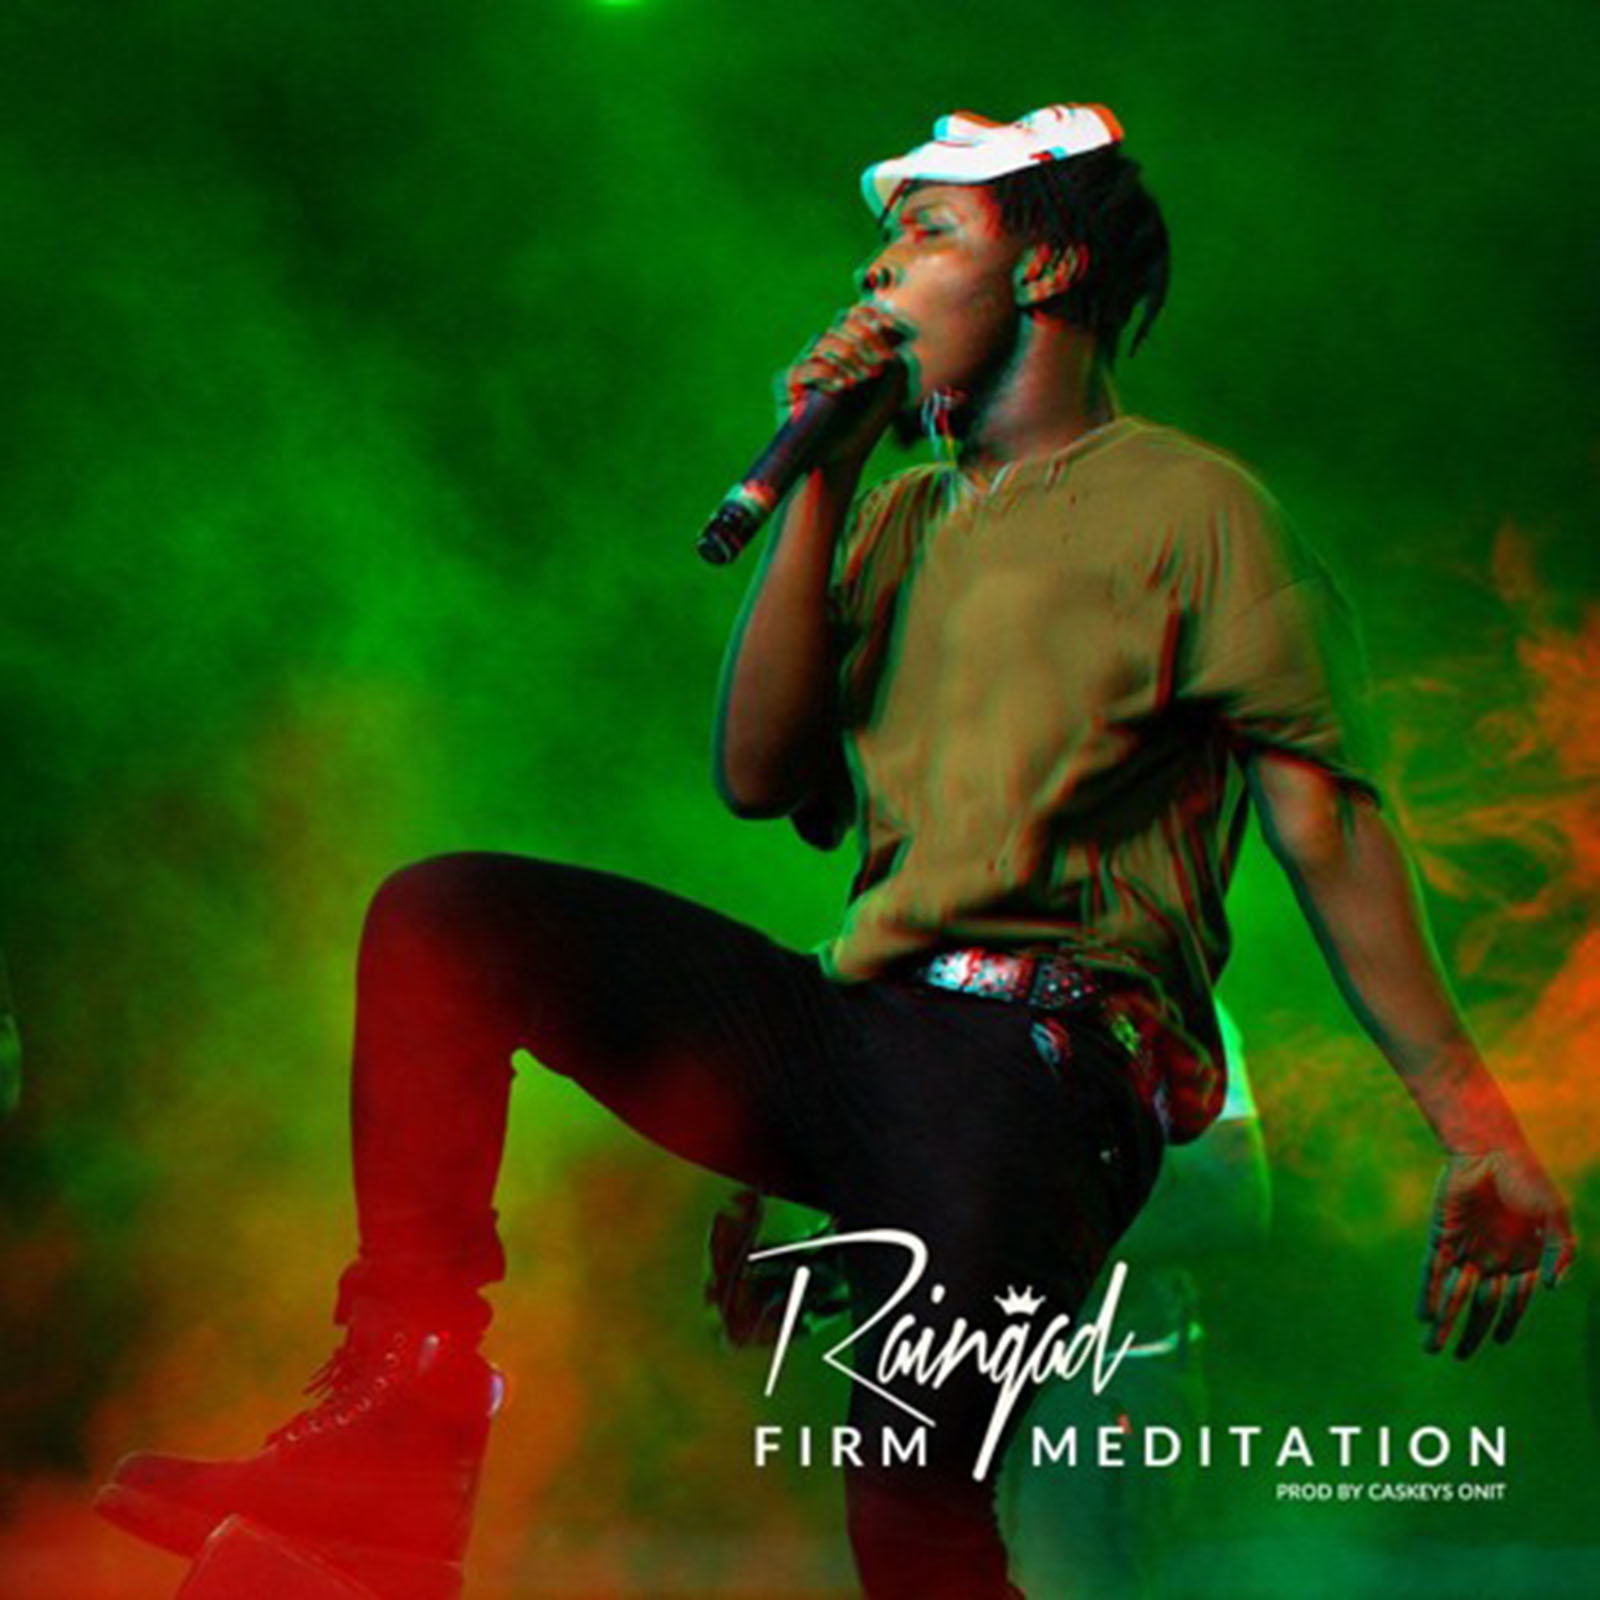 Firm Meditation by RainGod